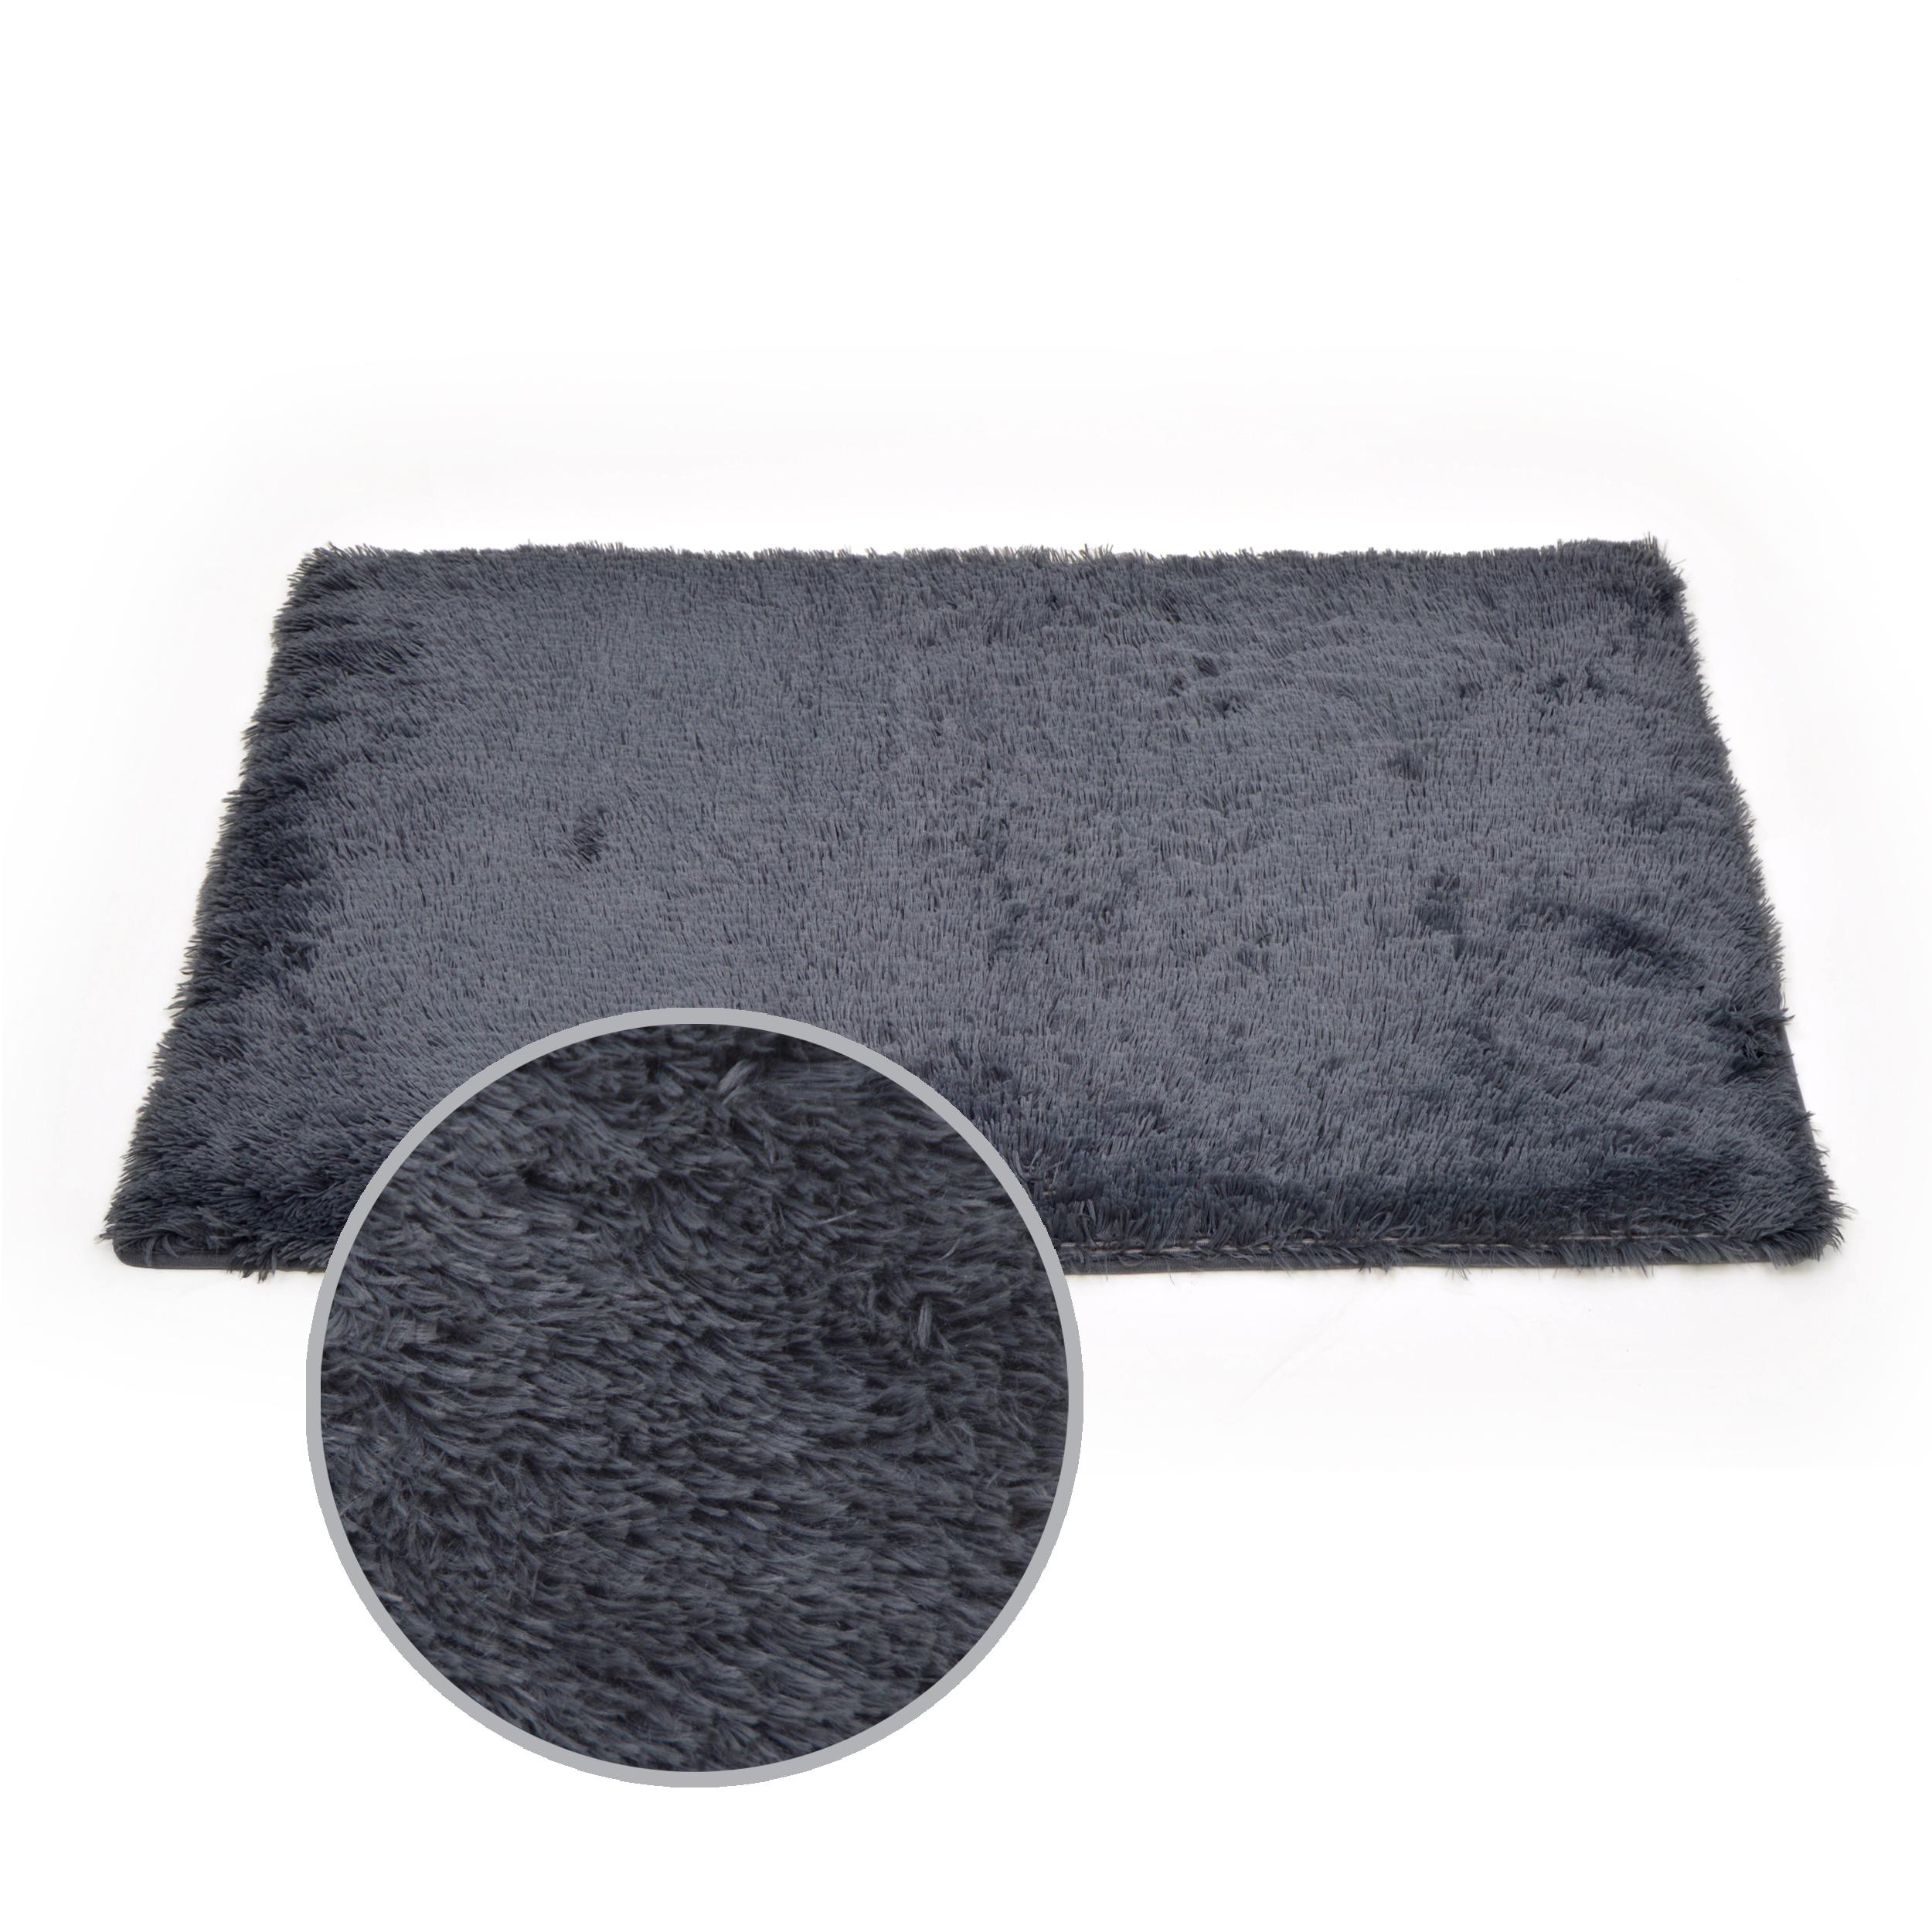 badgarnitur heaven grau badezimmer dusch bade matte teppich vorleger ebay. Black Bedroom Furniture Sets. Home Design Ideas